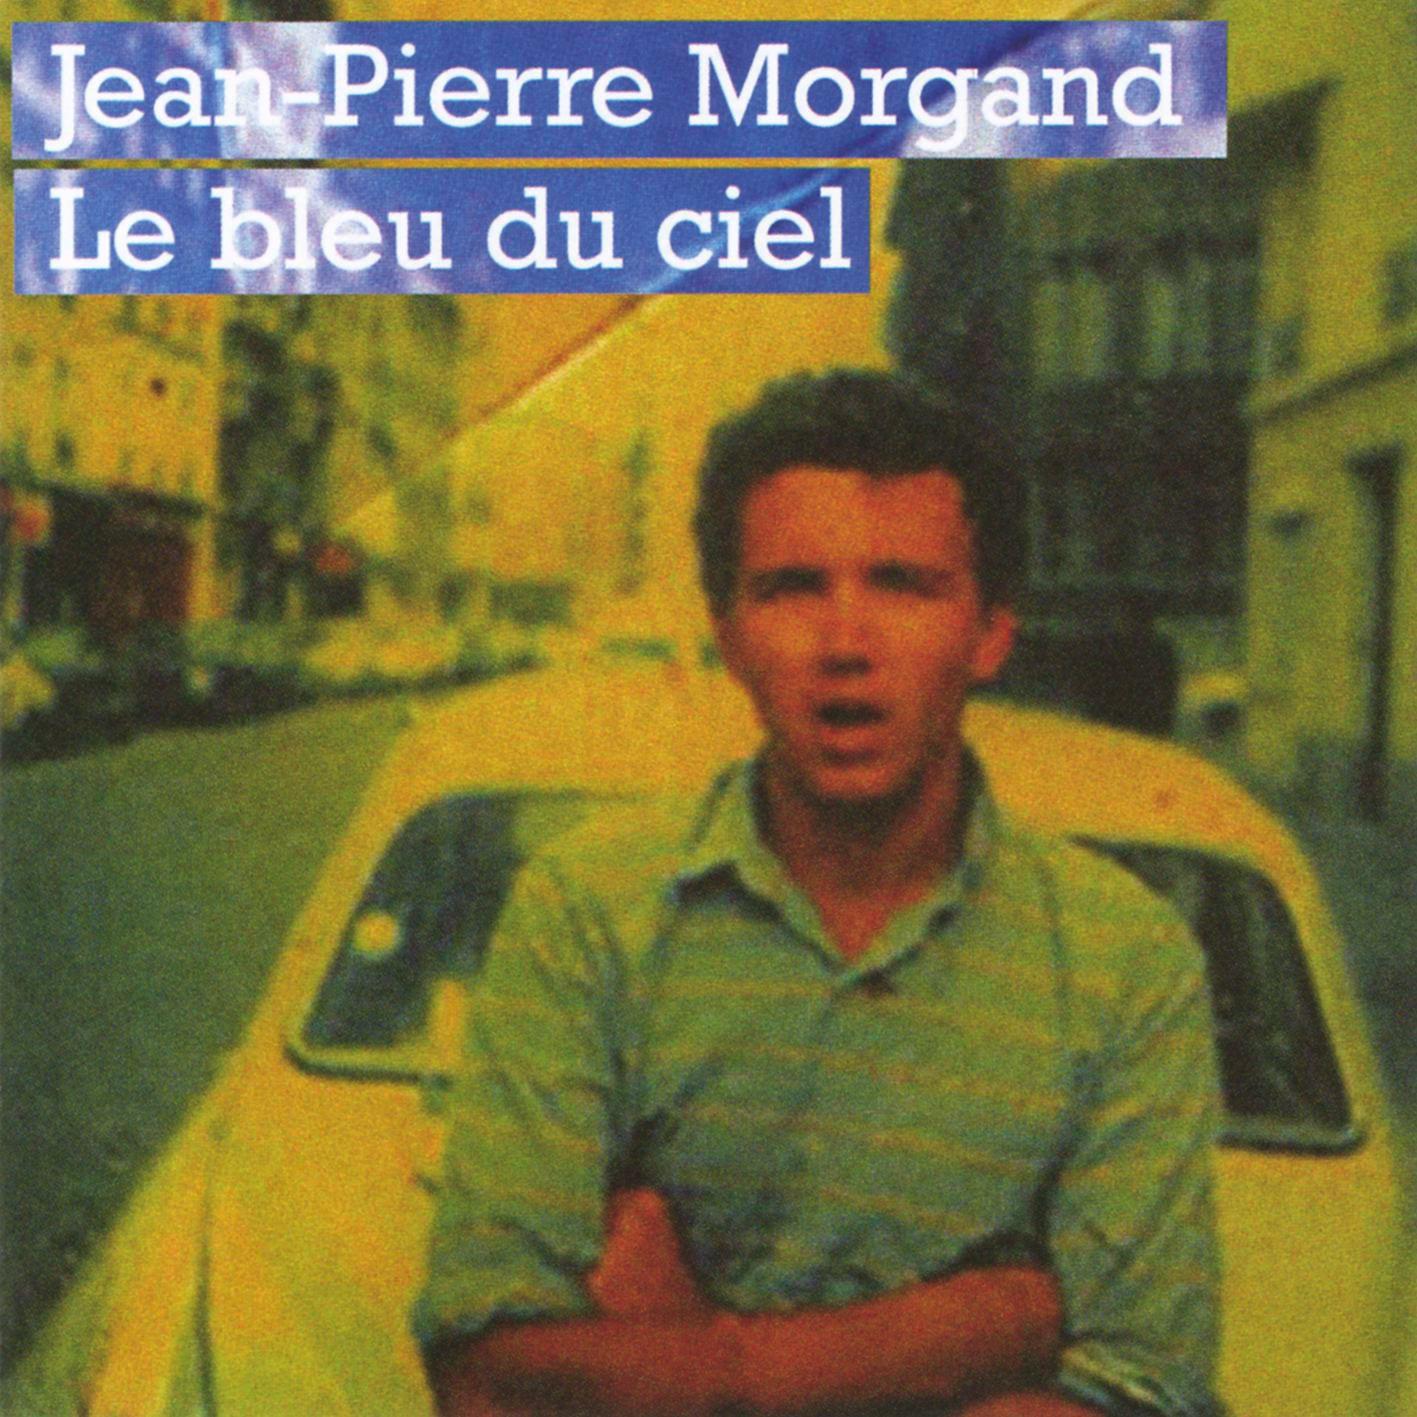 ALBUM-Morgand-bleu-1506066261.jpg